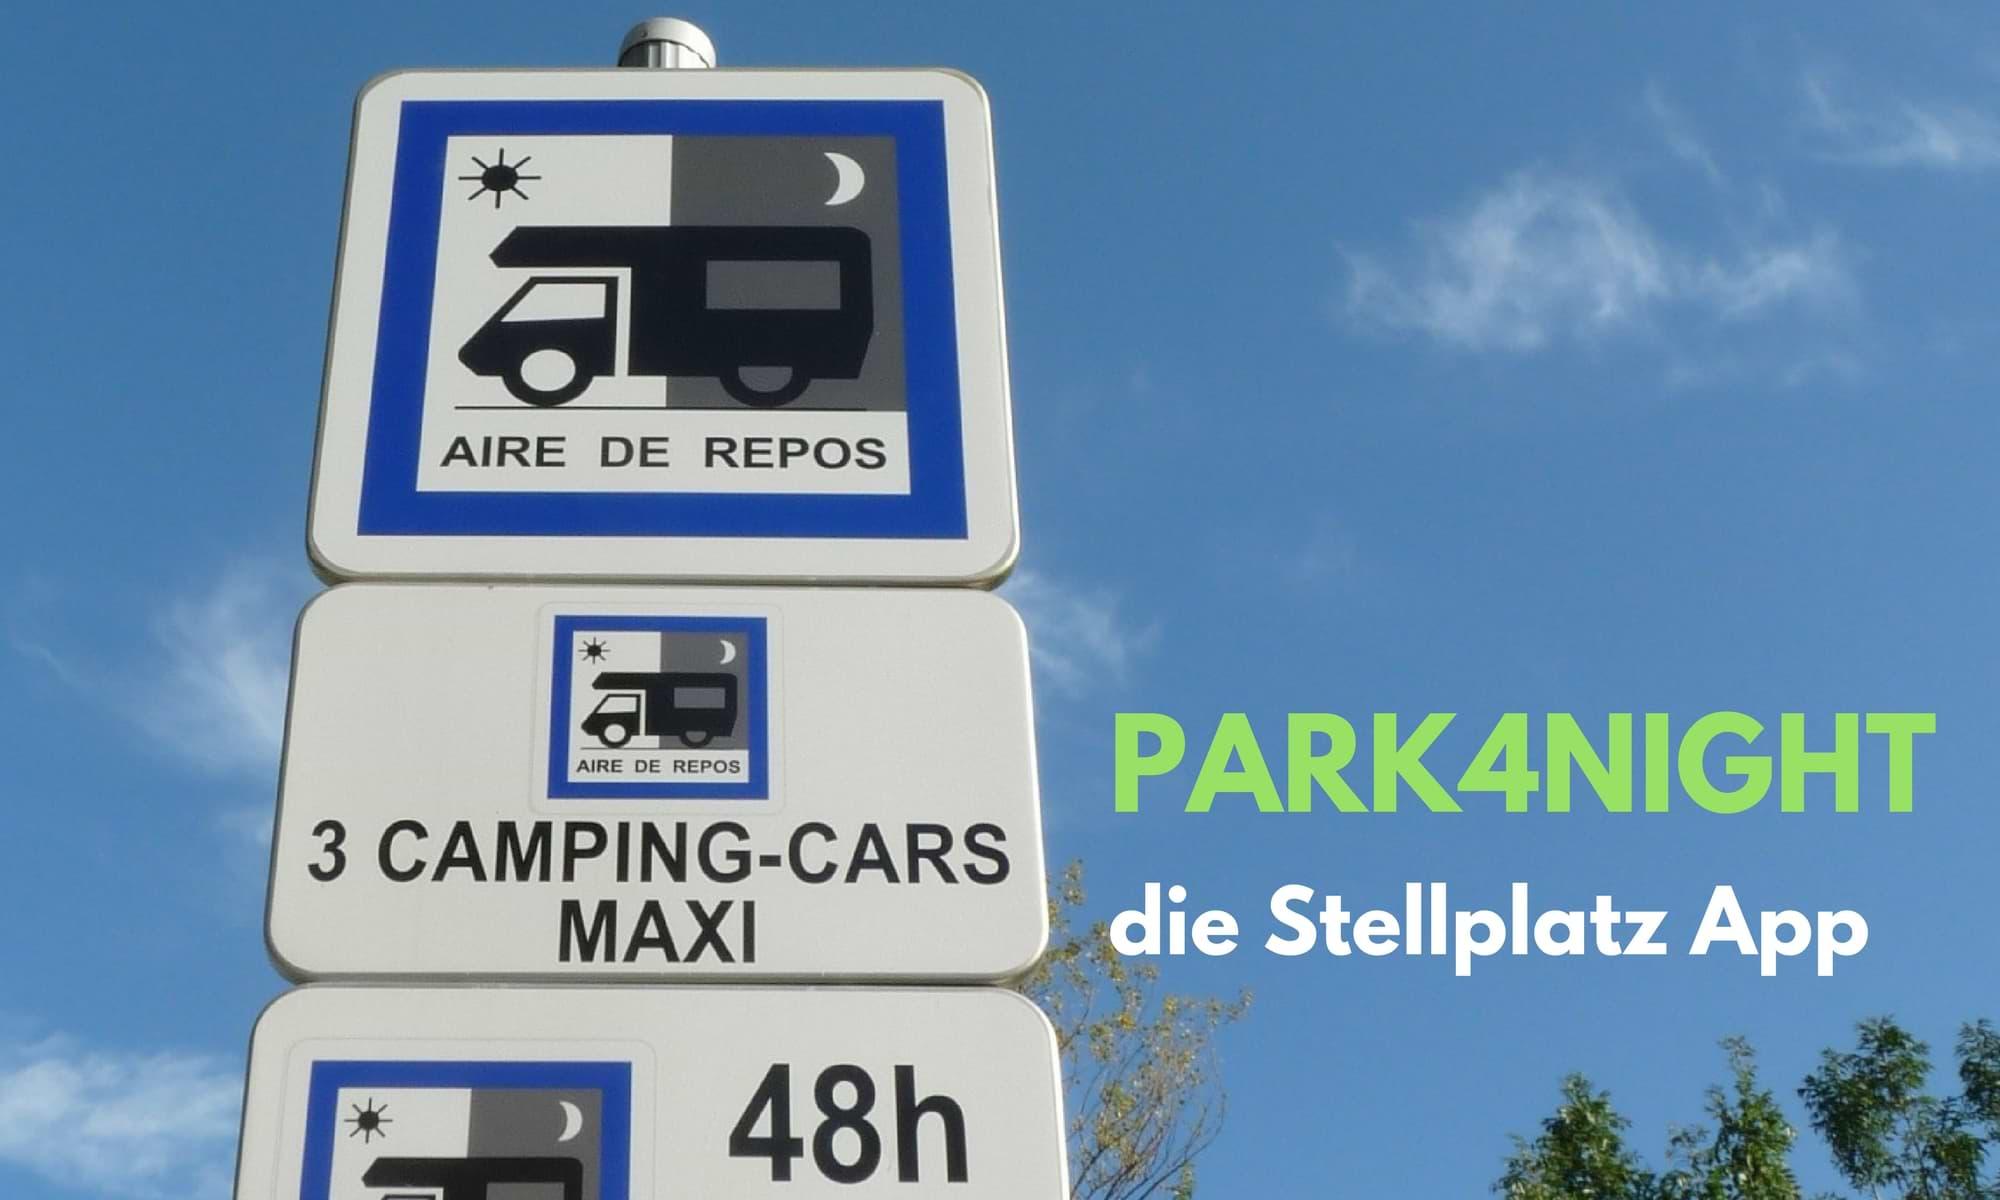 Park4Night Stellplatz App